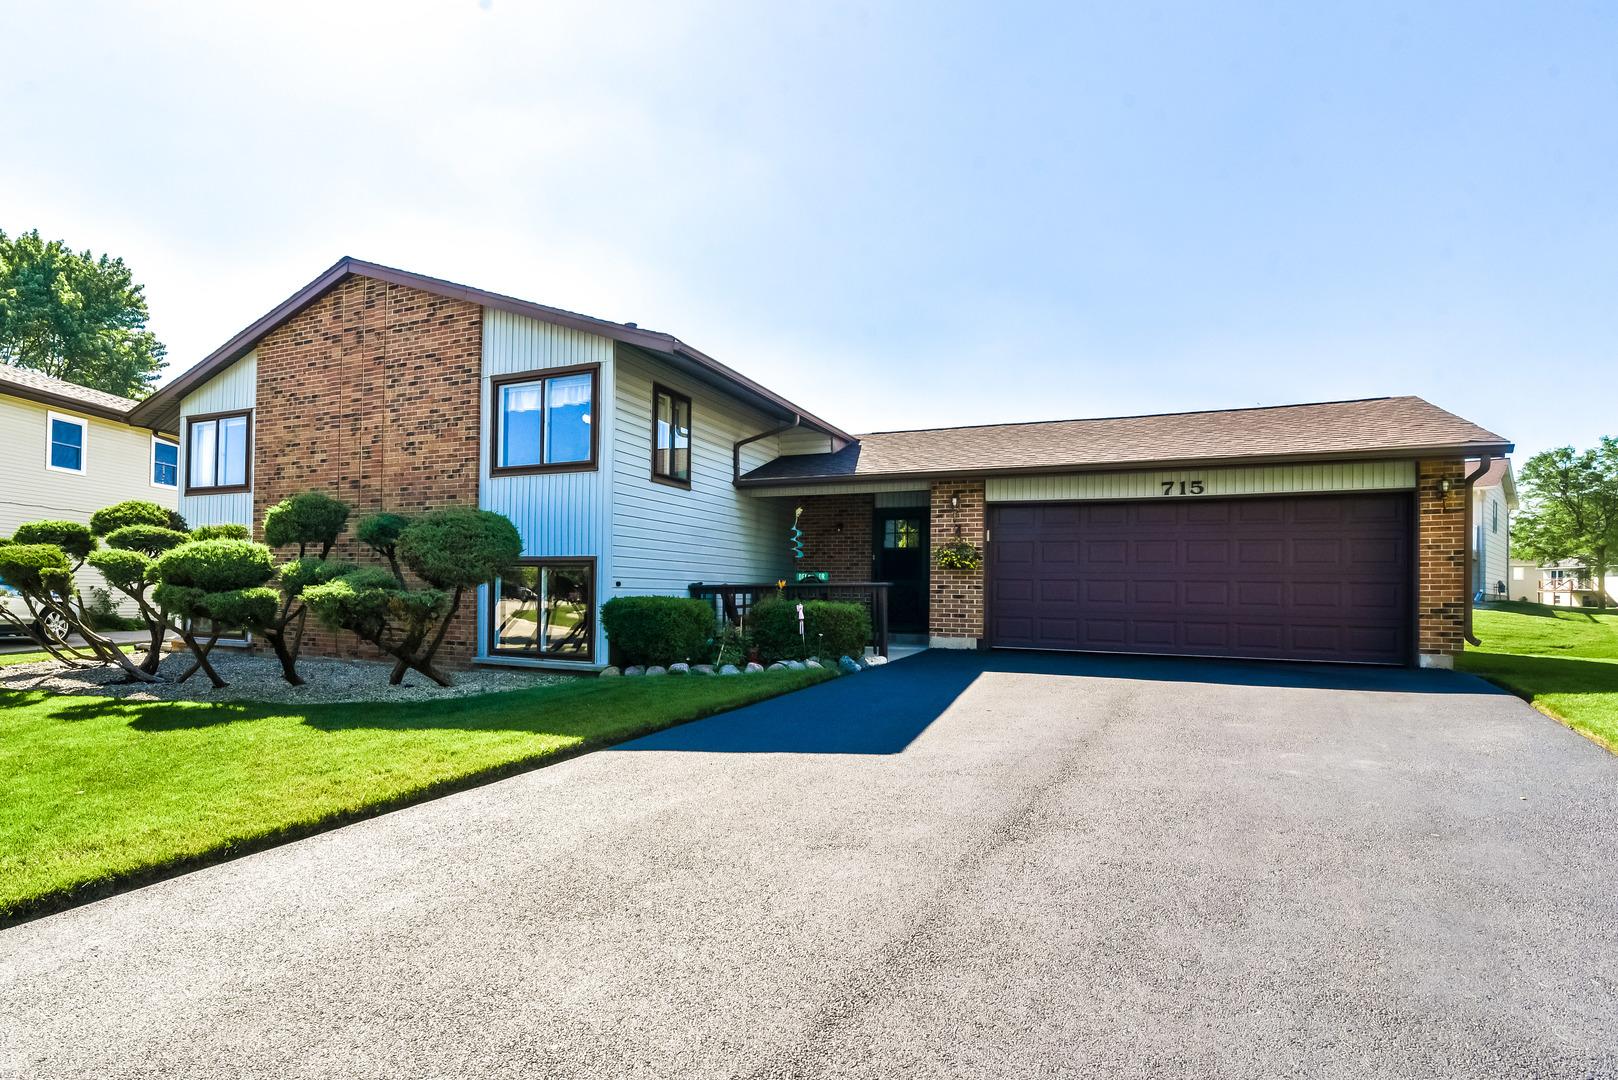 715 Oklahoma ,Elk Grove Village, Illinois 60007